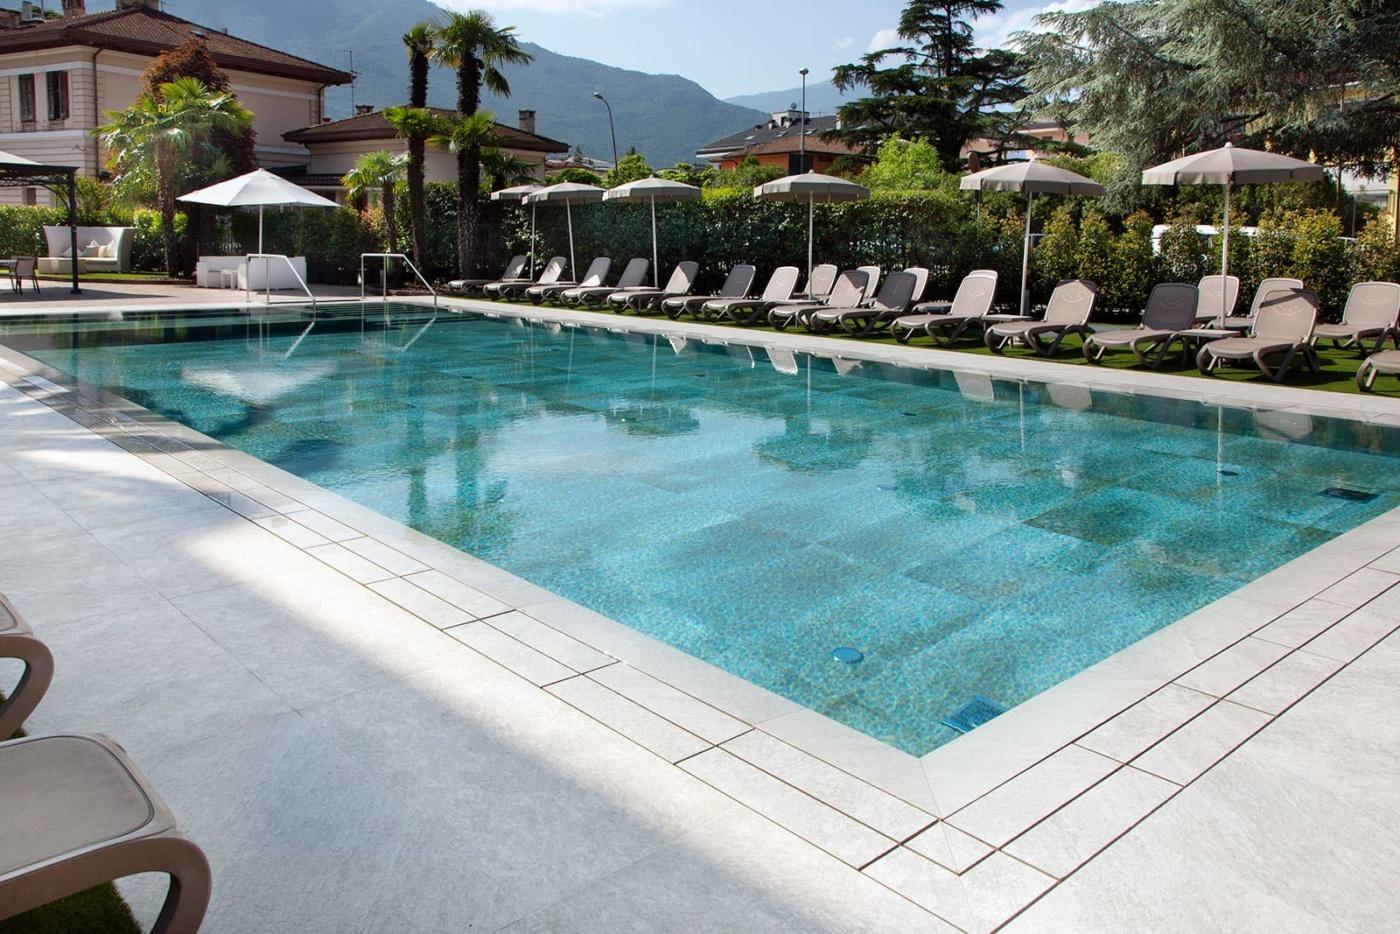 4 Sterne Hotel Am Gardasee Wellness Urlaub Arco